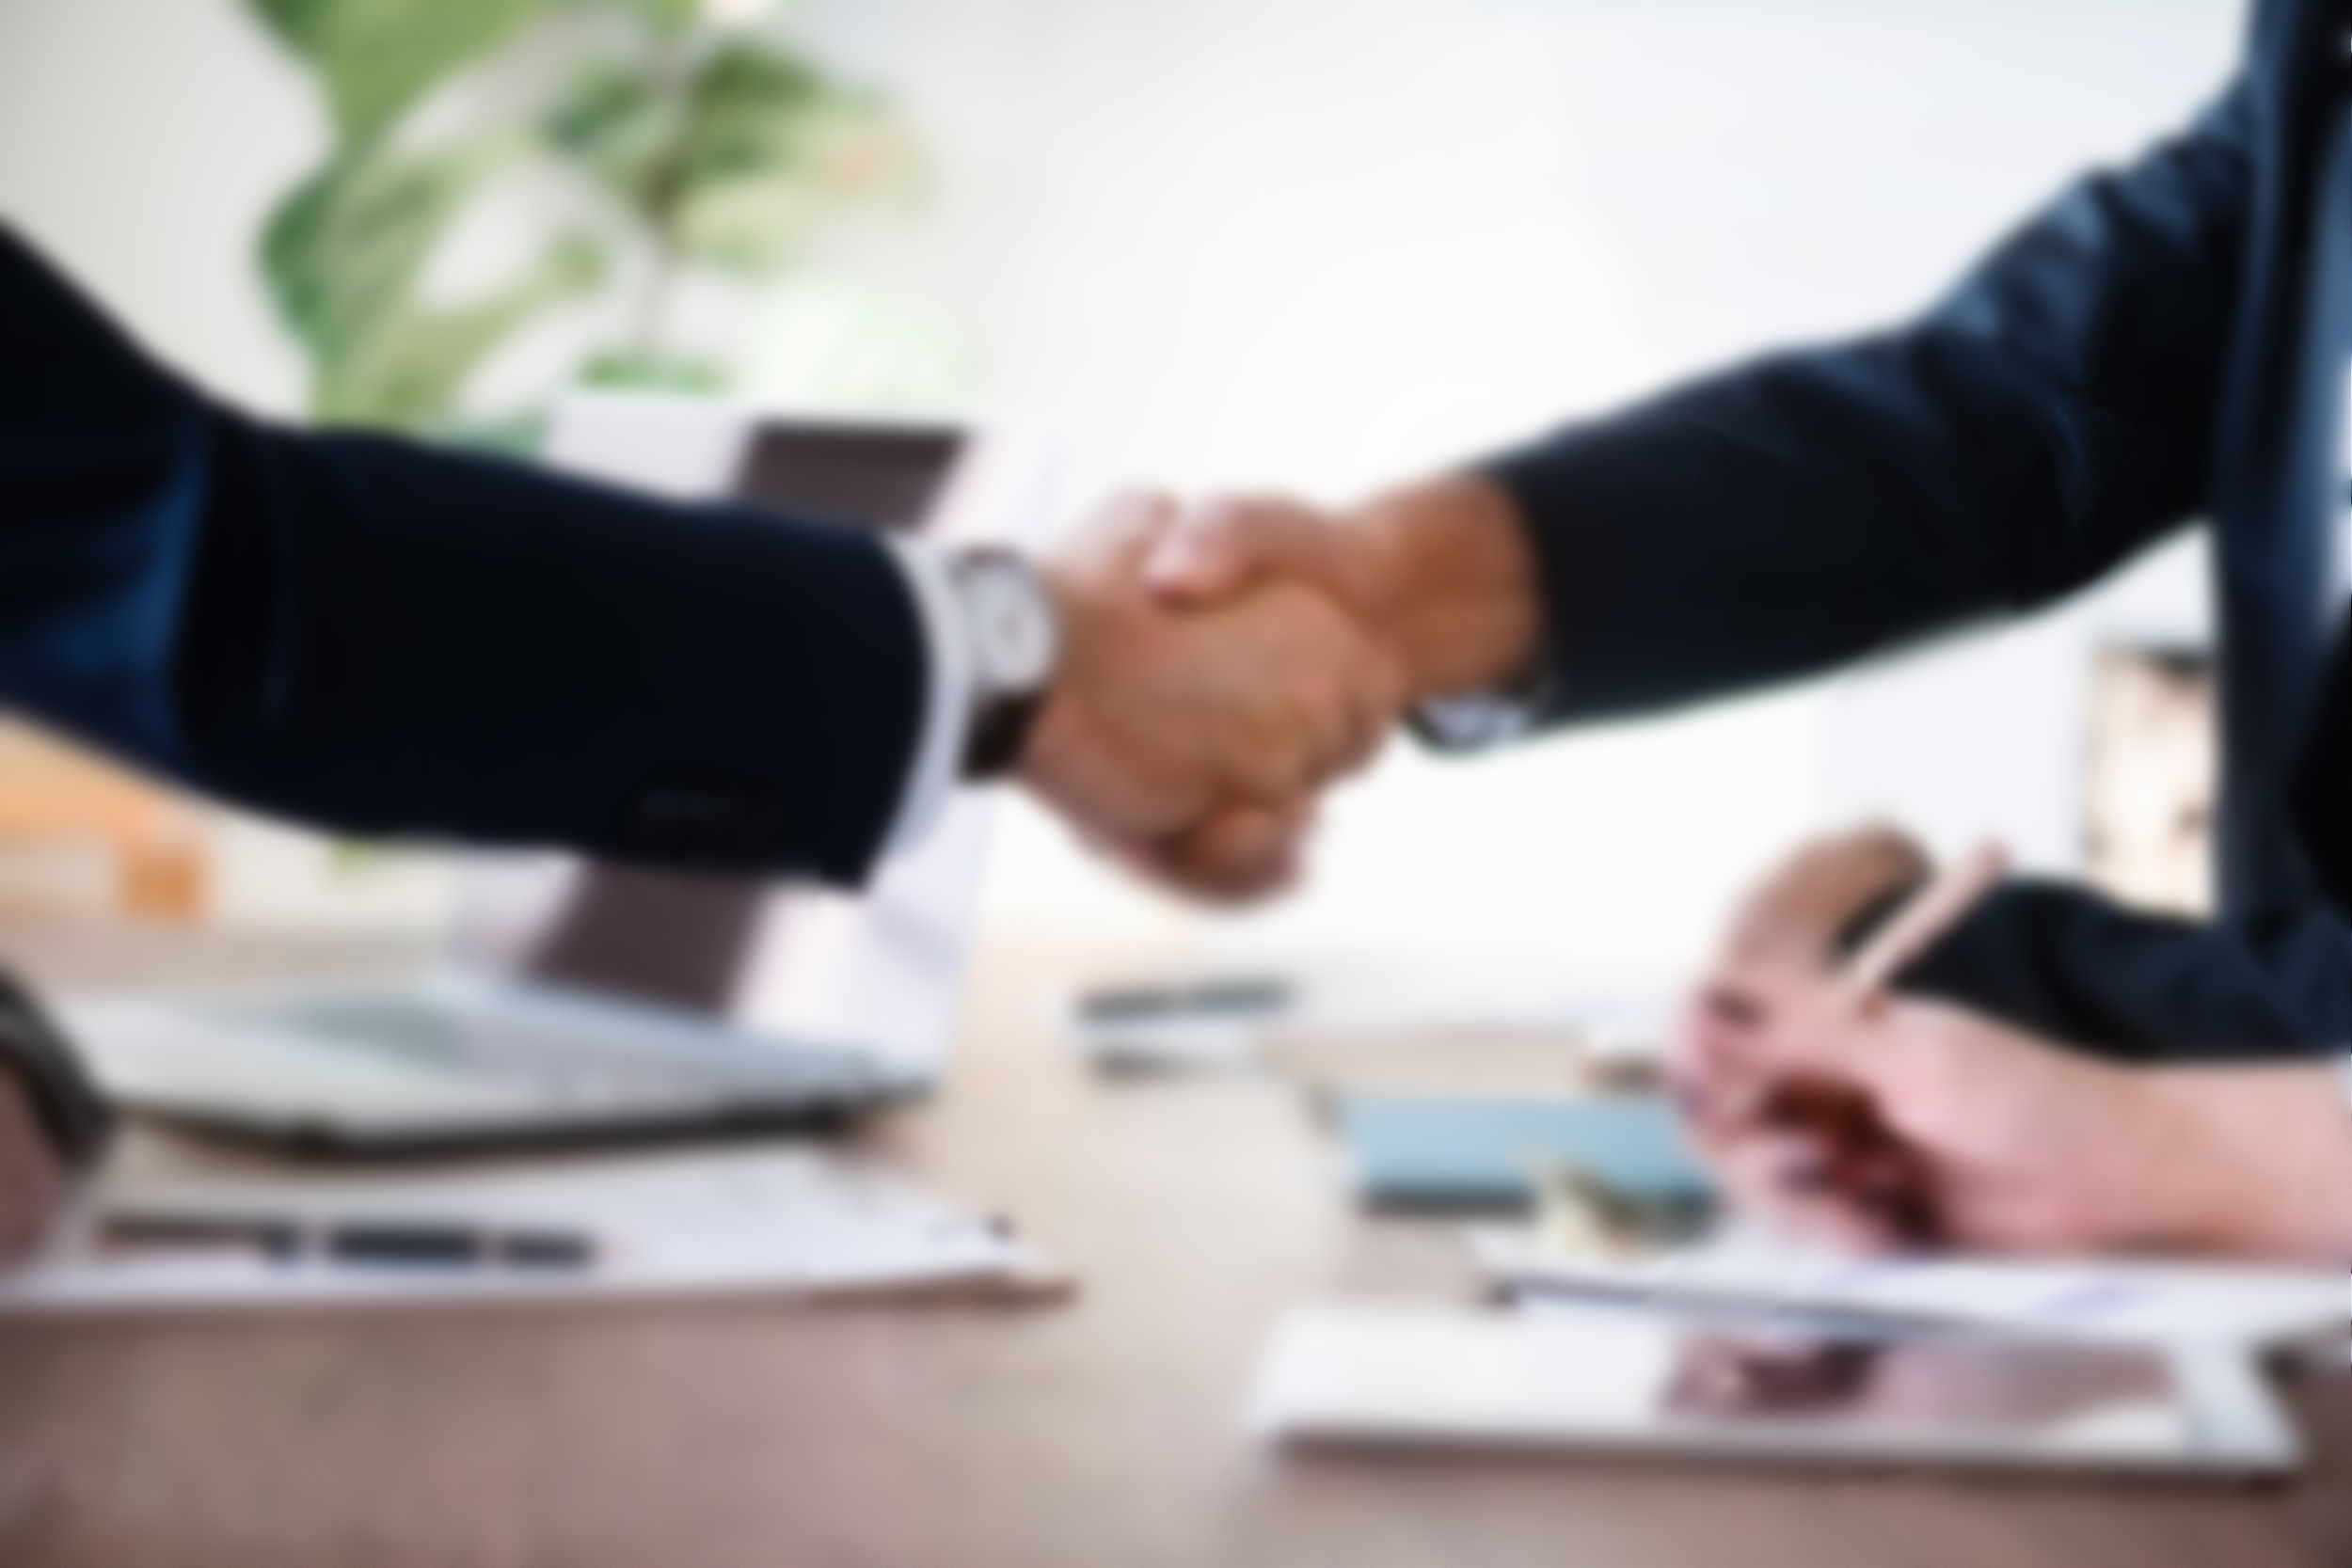 WE ACQUIRE PROFITABLE ONLINE BUSINESSES. -